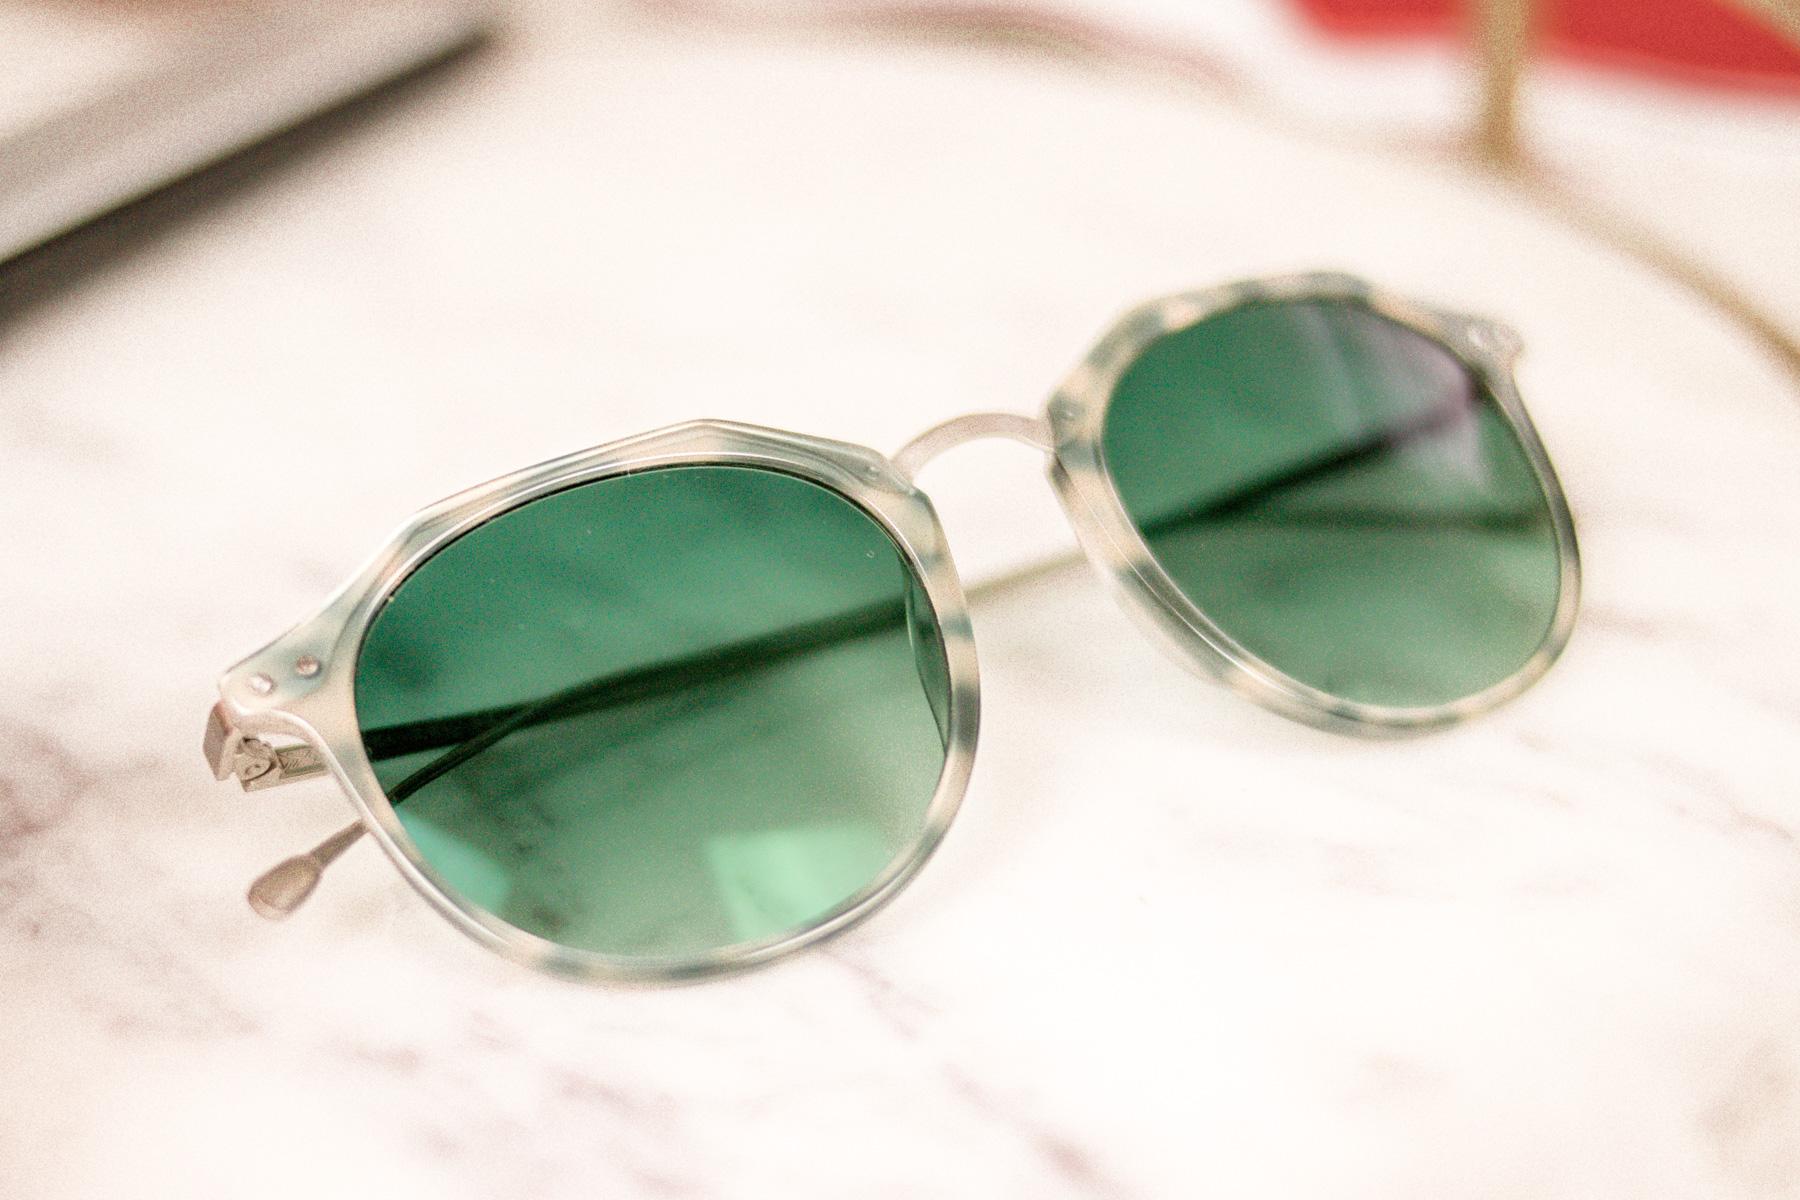 Zenni Optical Sunglasses are a festival must have #FestivalFabBBxx